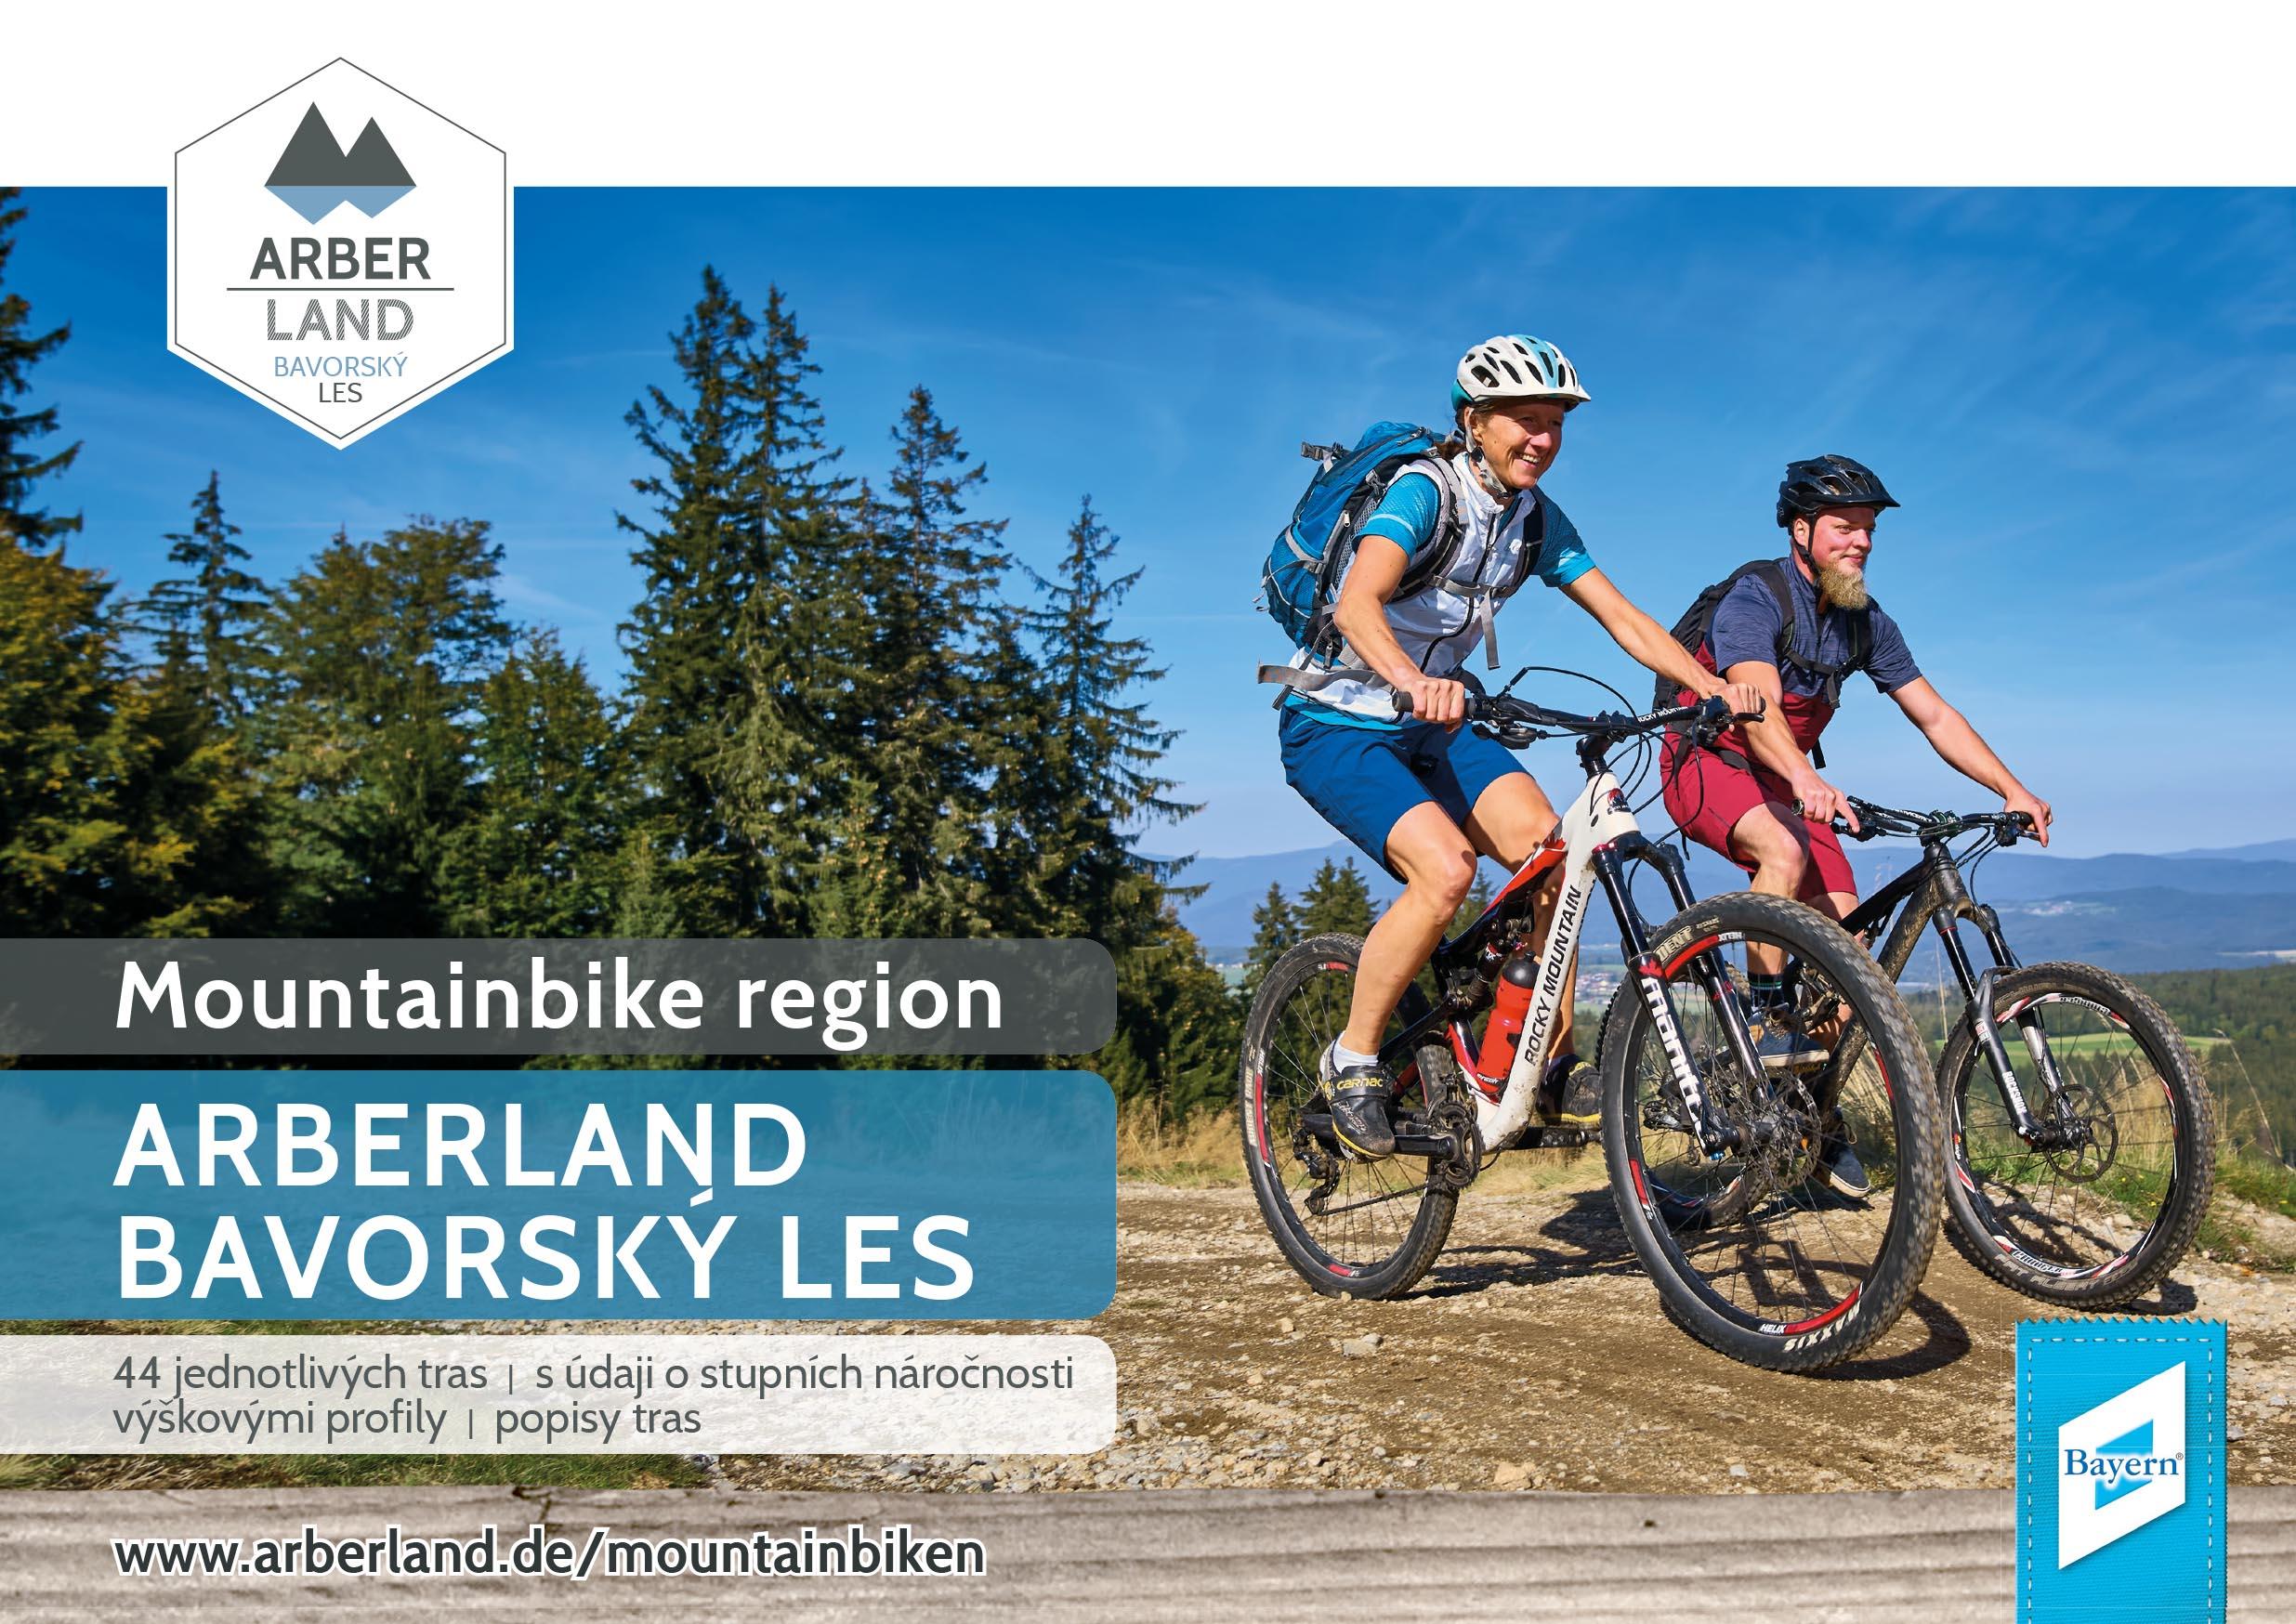 Mountainbike region ARBERLAND BAVORSKÝ LES. Foto: ARBERLAND REGio GmbH.